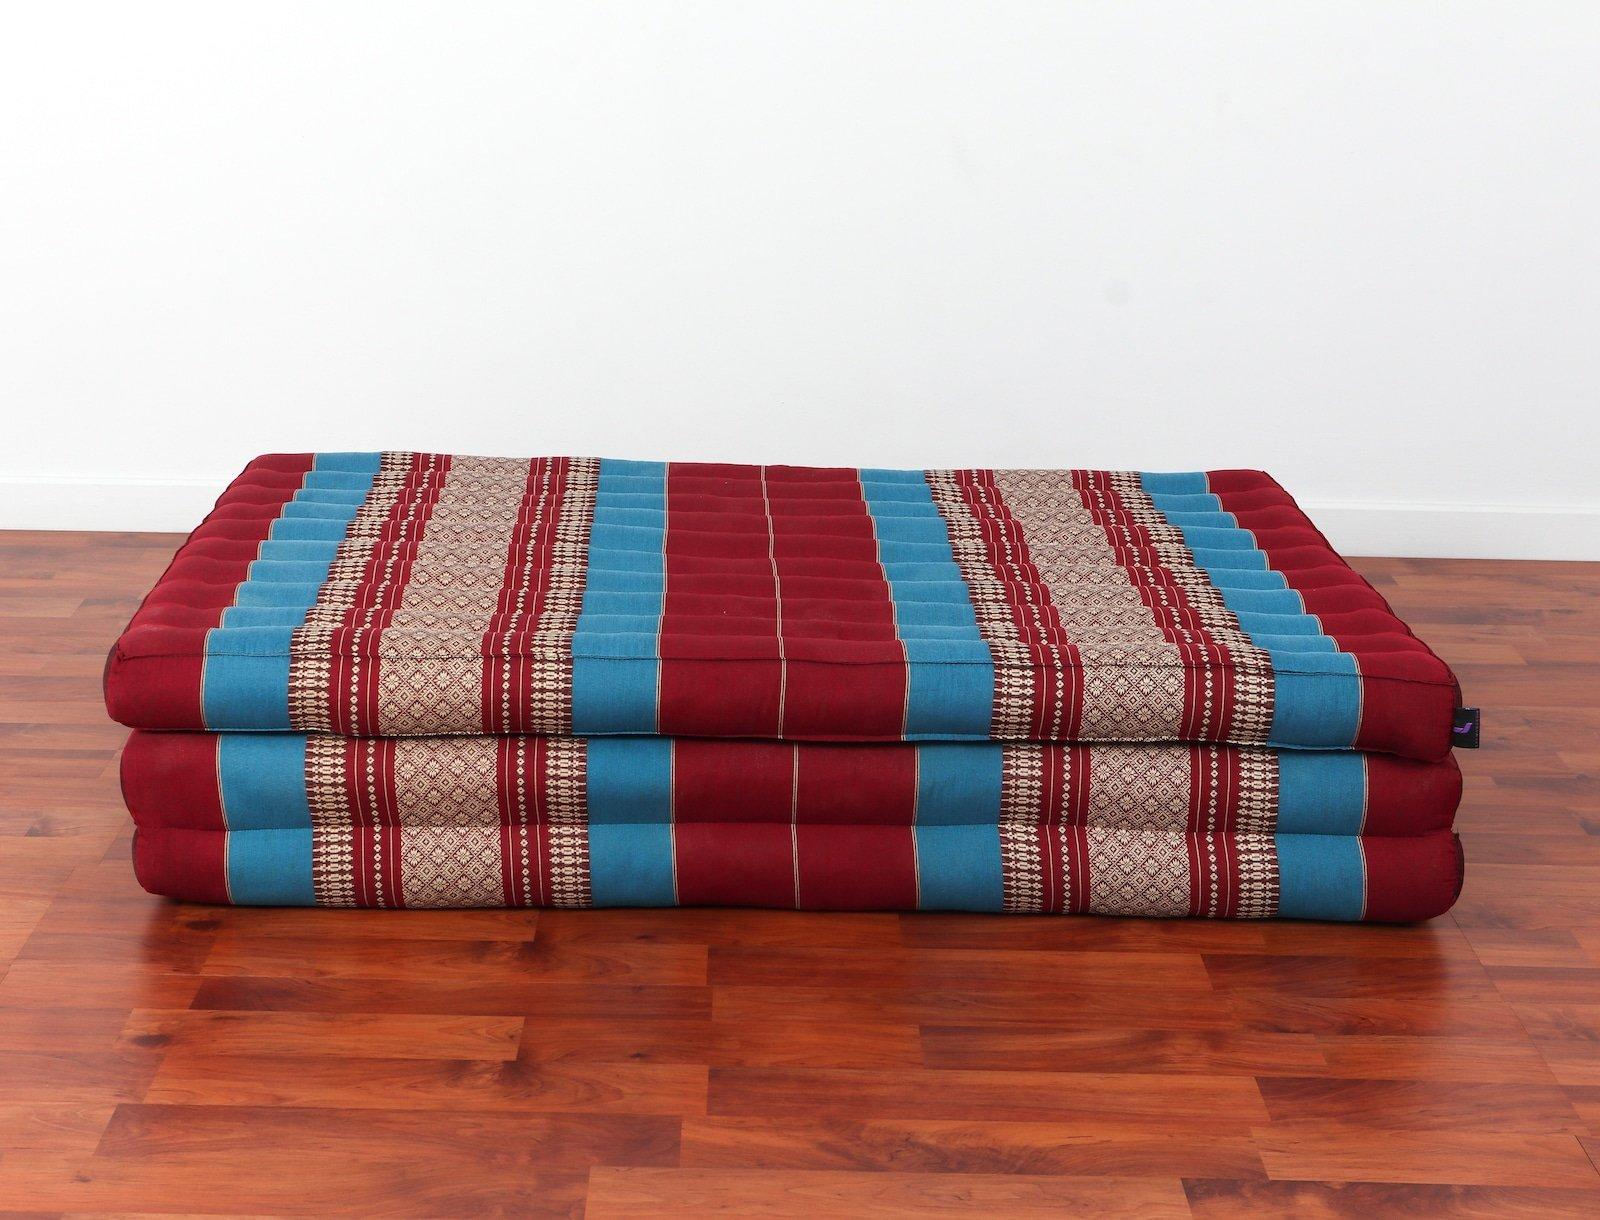 Leewadee Thai Massage Mat XL, 82x46x3 inches, Kapok, Blue red by Leewadee (Image #2)